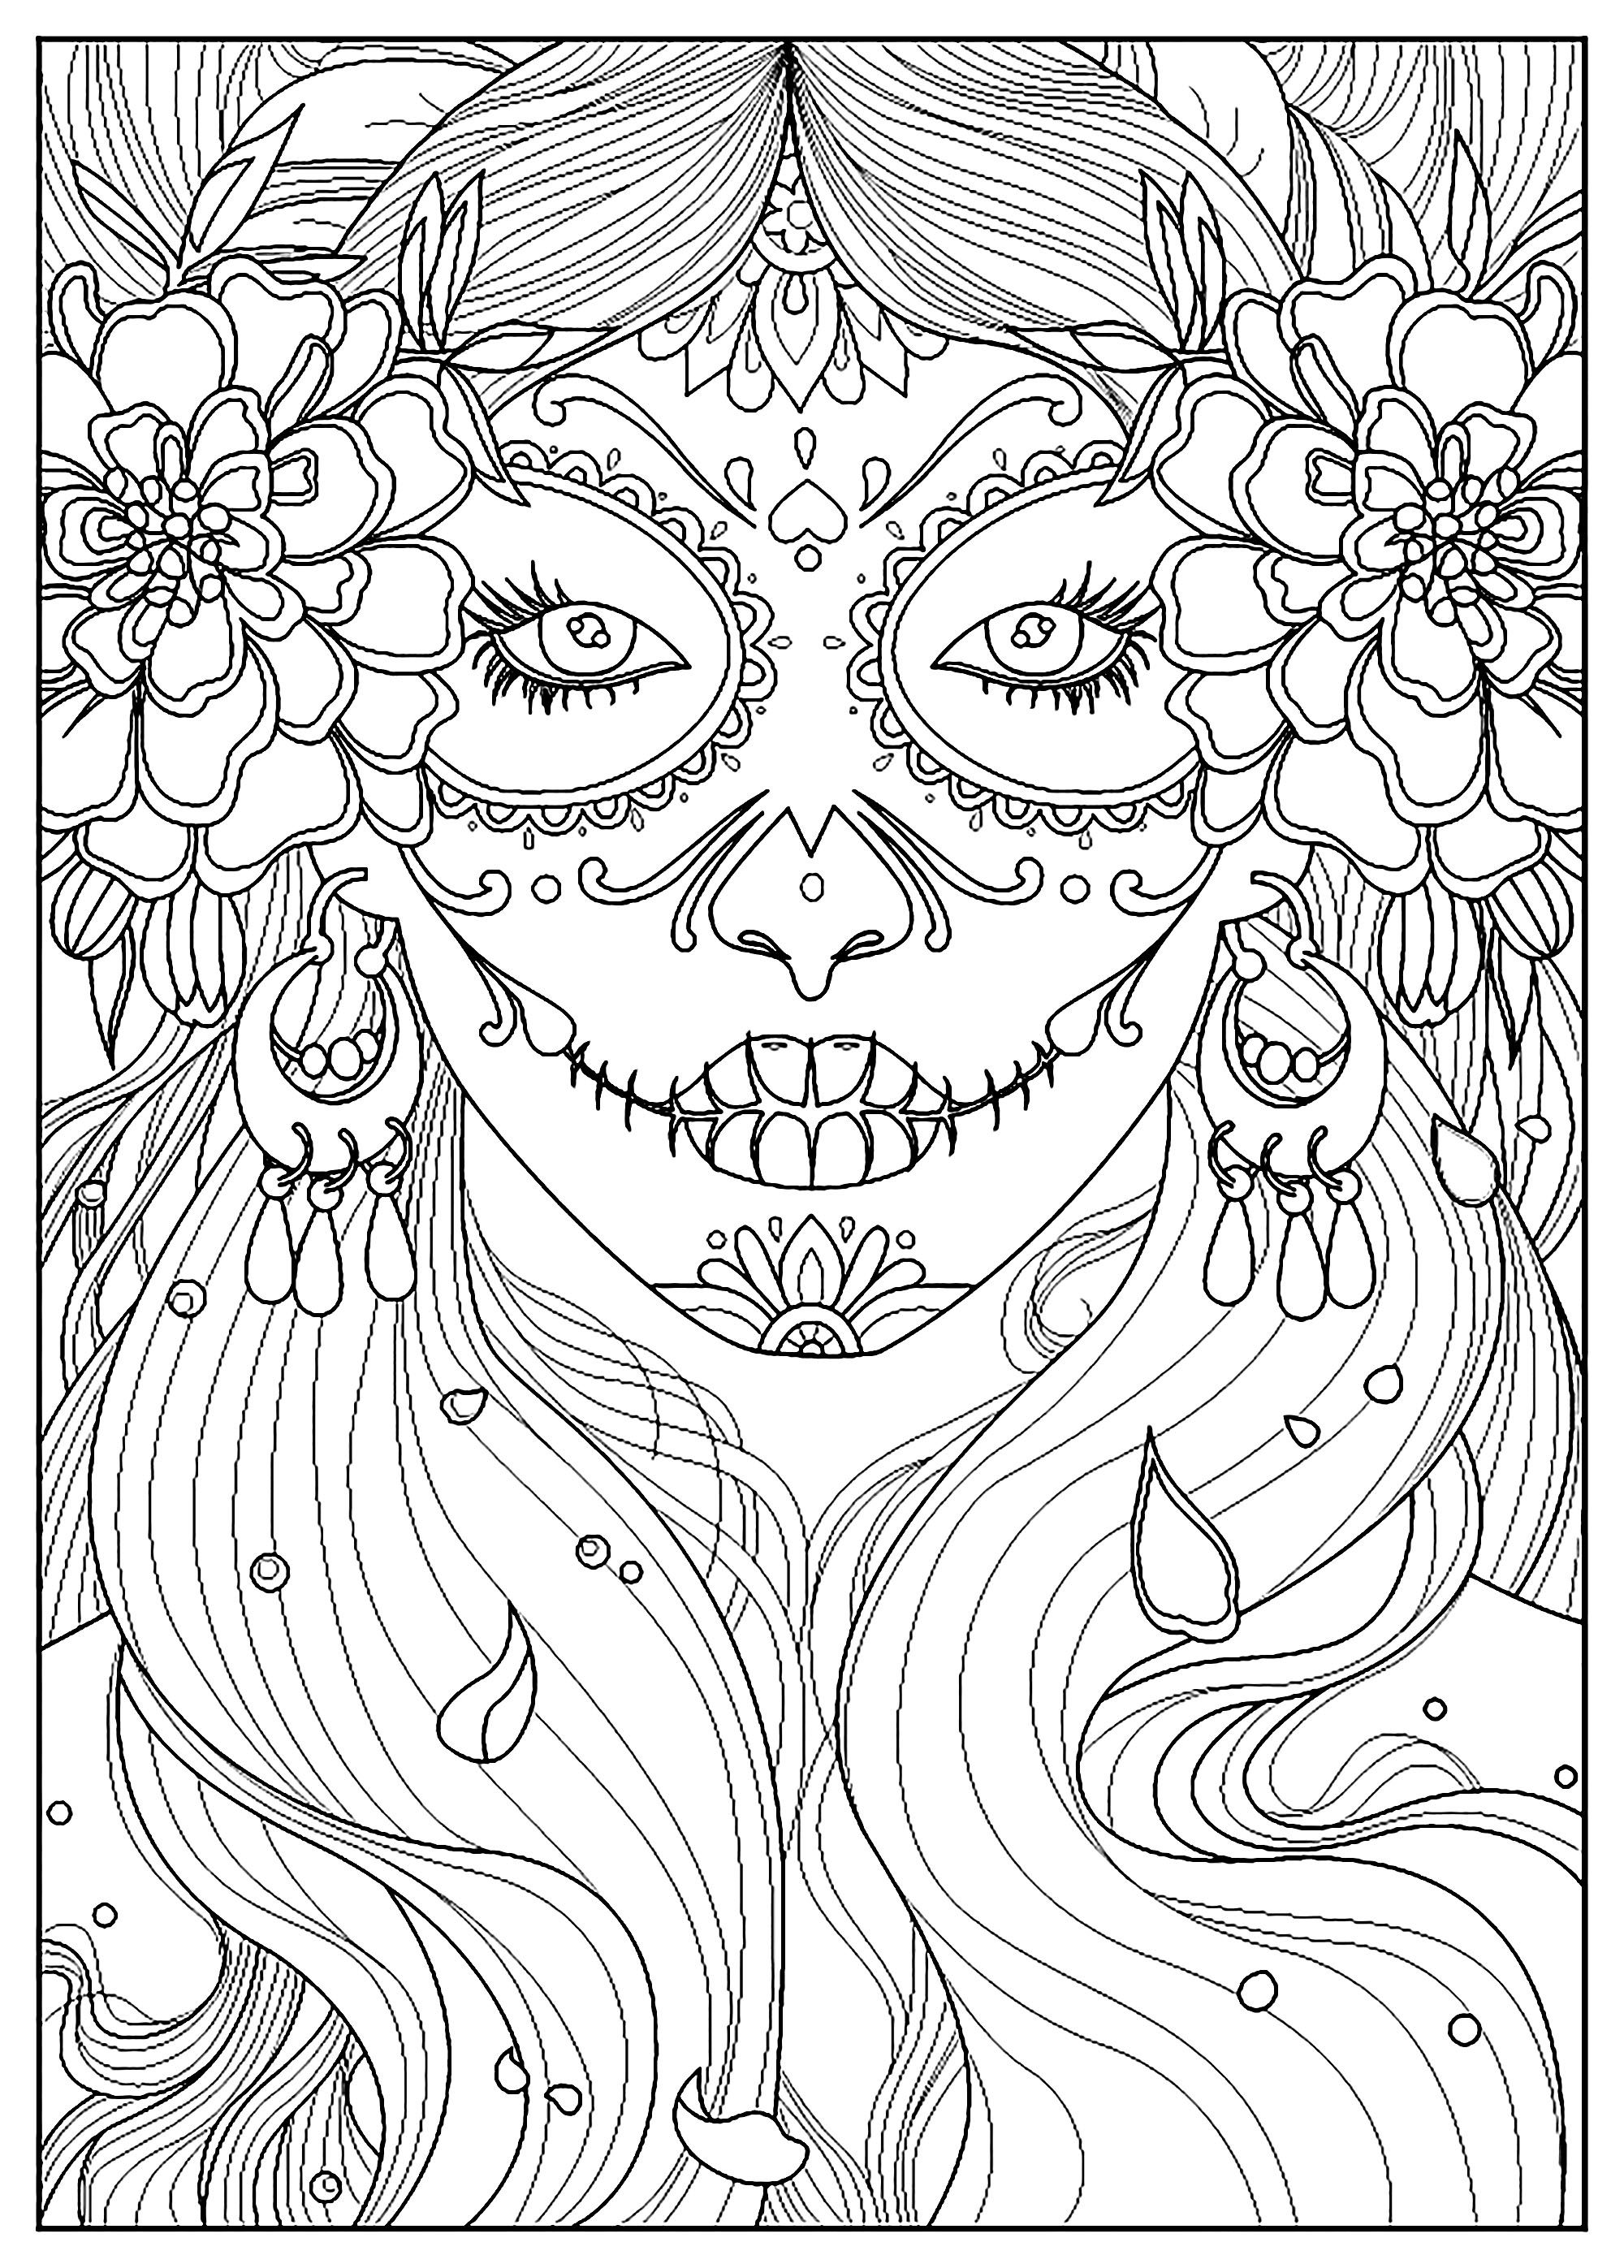 Day Of The Dead El Dia De Los Muertos Coloring Pages For Adults